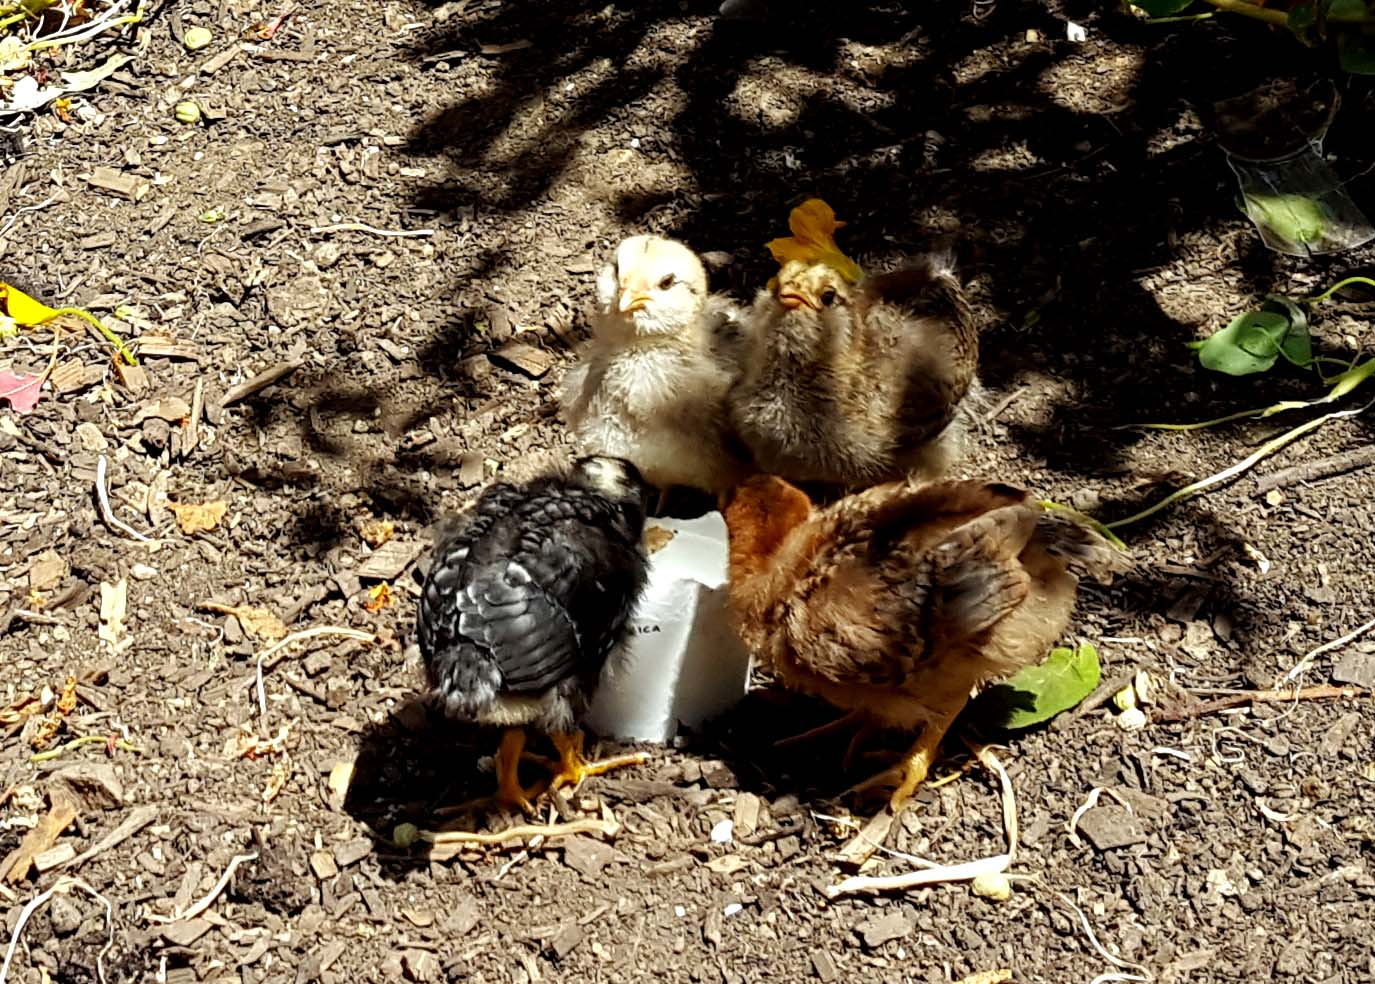 chickens_chicks_week2_4kidsdrink_630x451